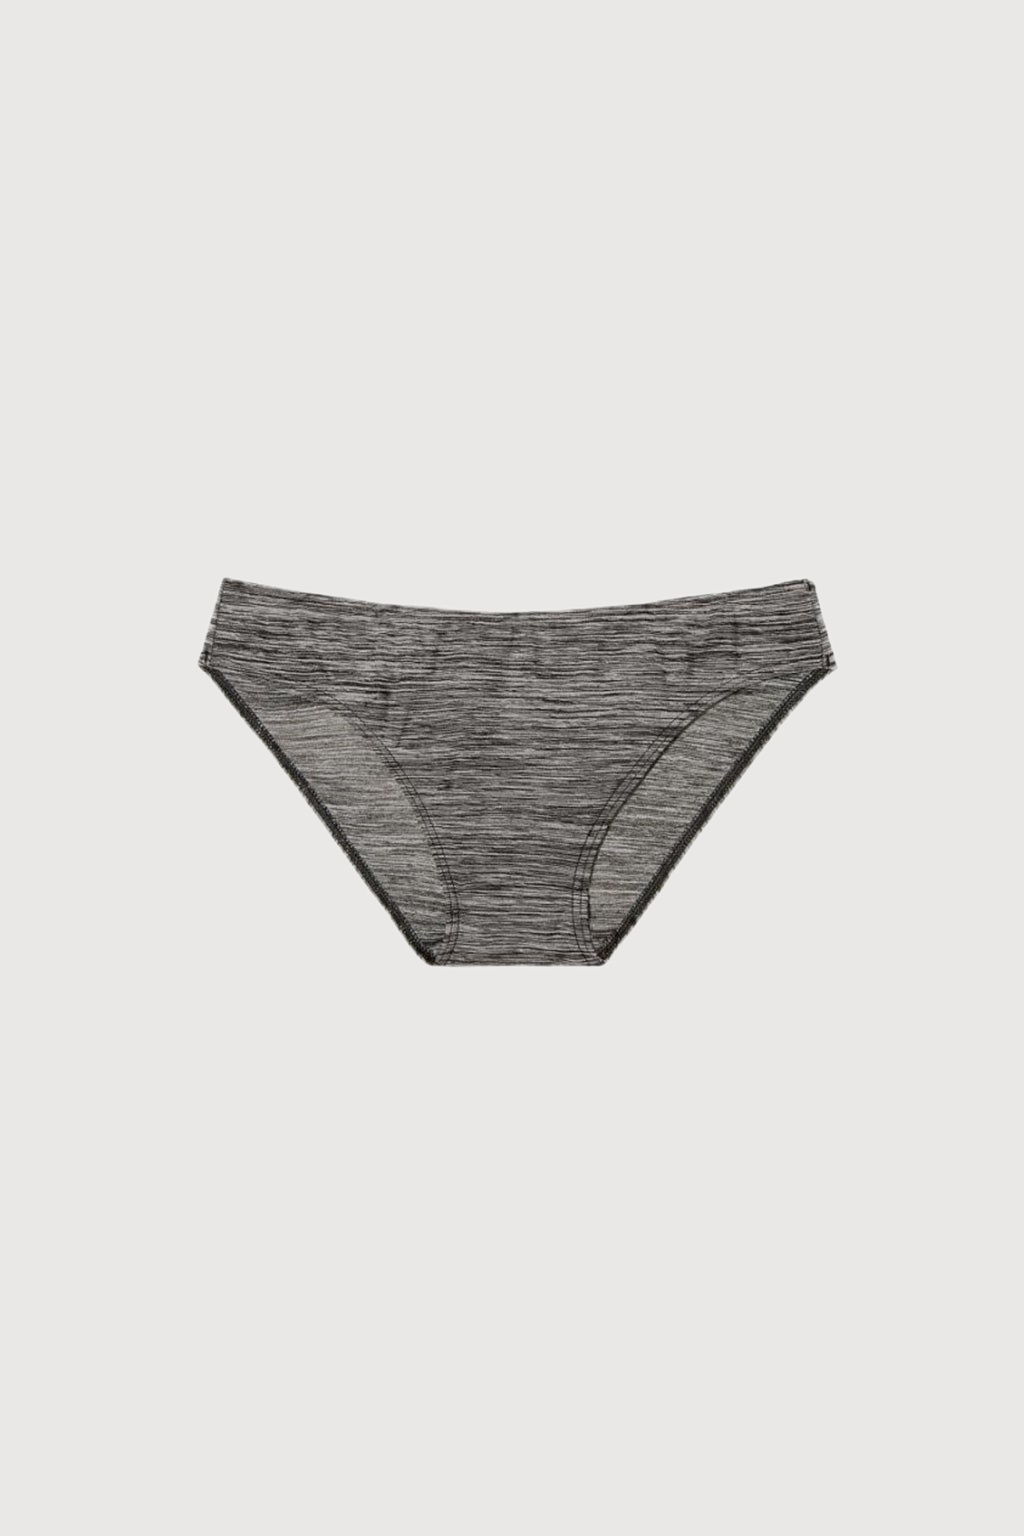 Bikiny kalhotky Victoria's Secret – Bikini Panty – šedé